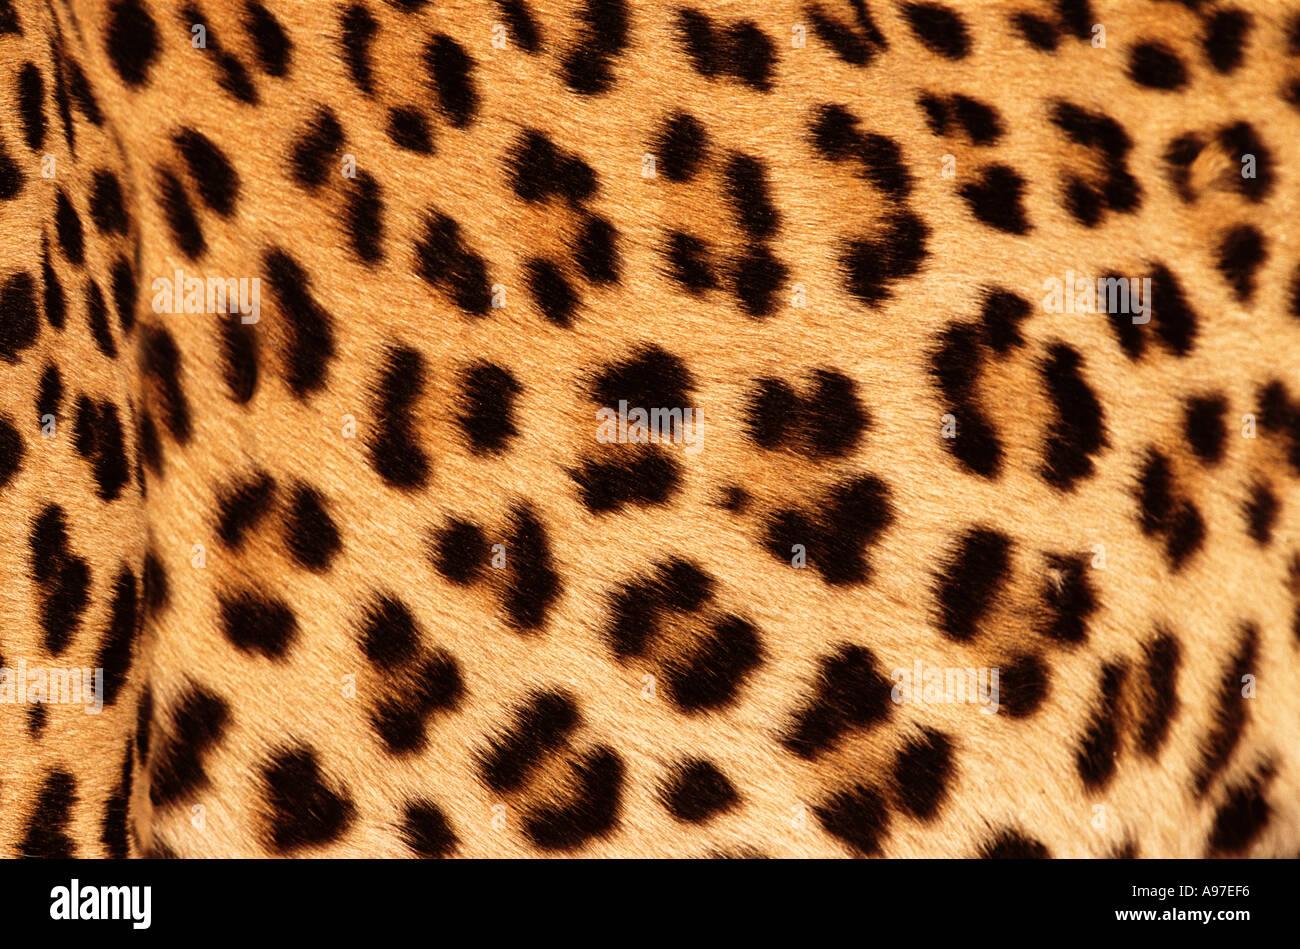 Pelle di leopardoFoto Stock